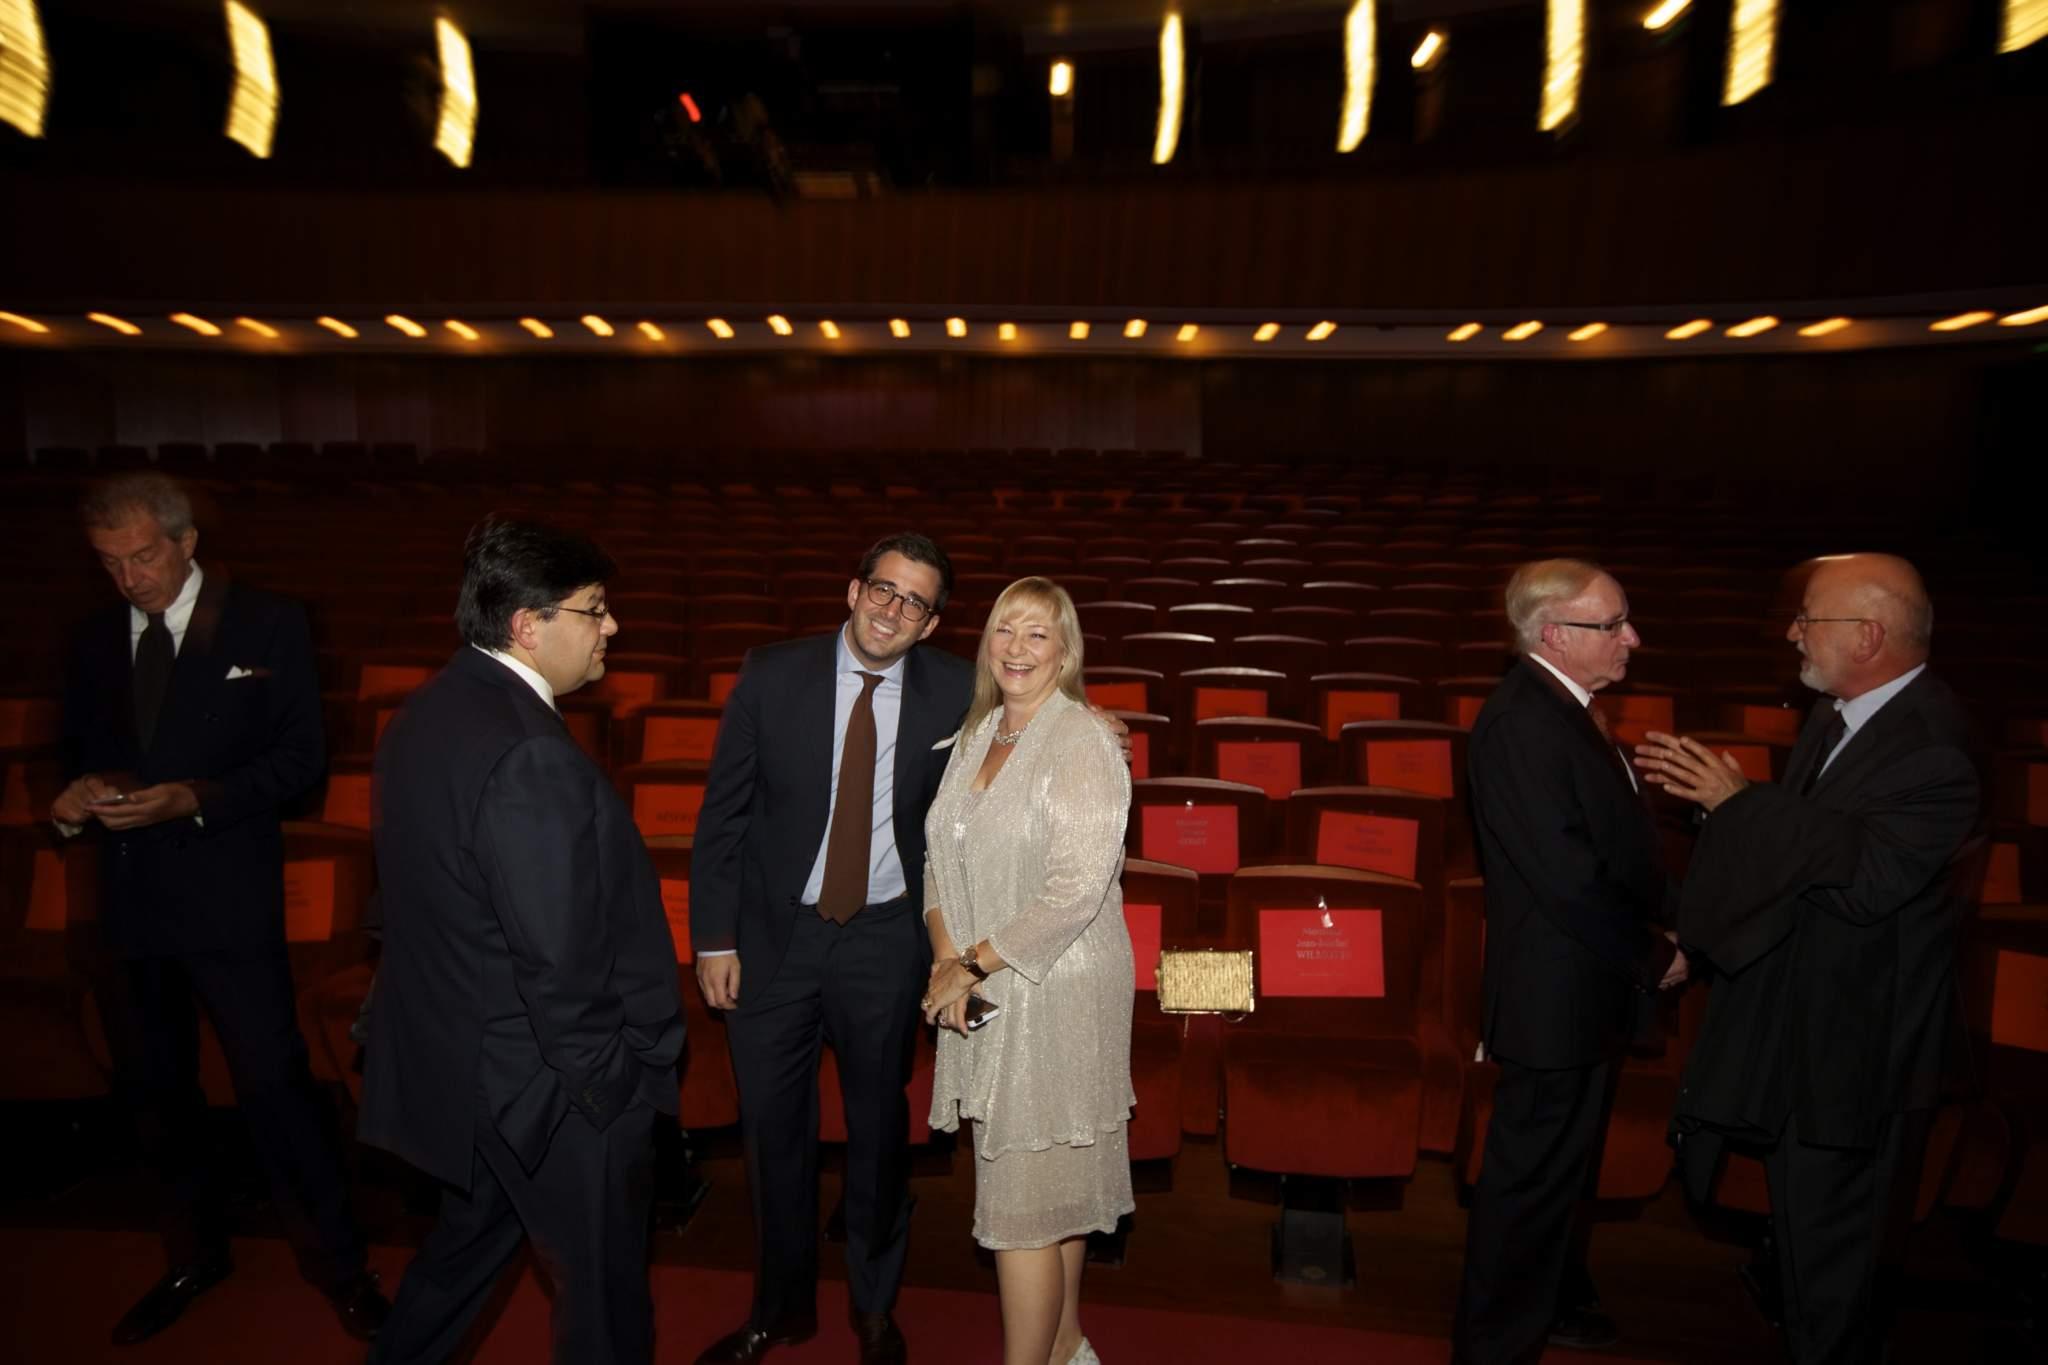 John Goldberger, Sean Li, Benjamin Clymer, Elizabeth Doerr, Dominique Fléchon and Jean-Philippe Arm  (jury members of the GPHG 2014)